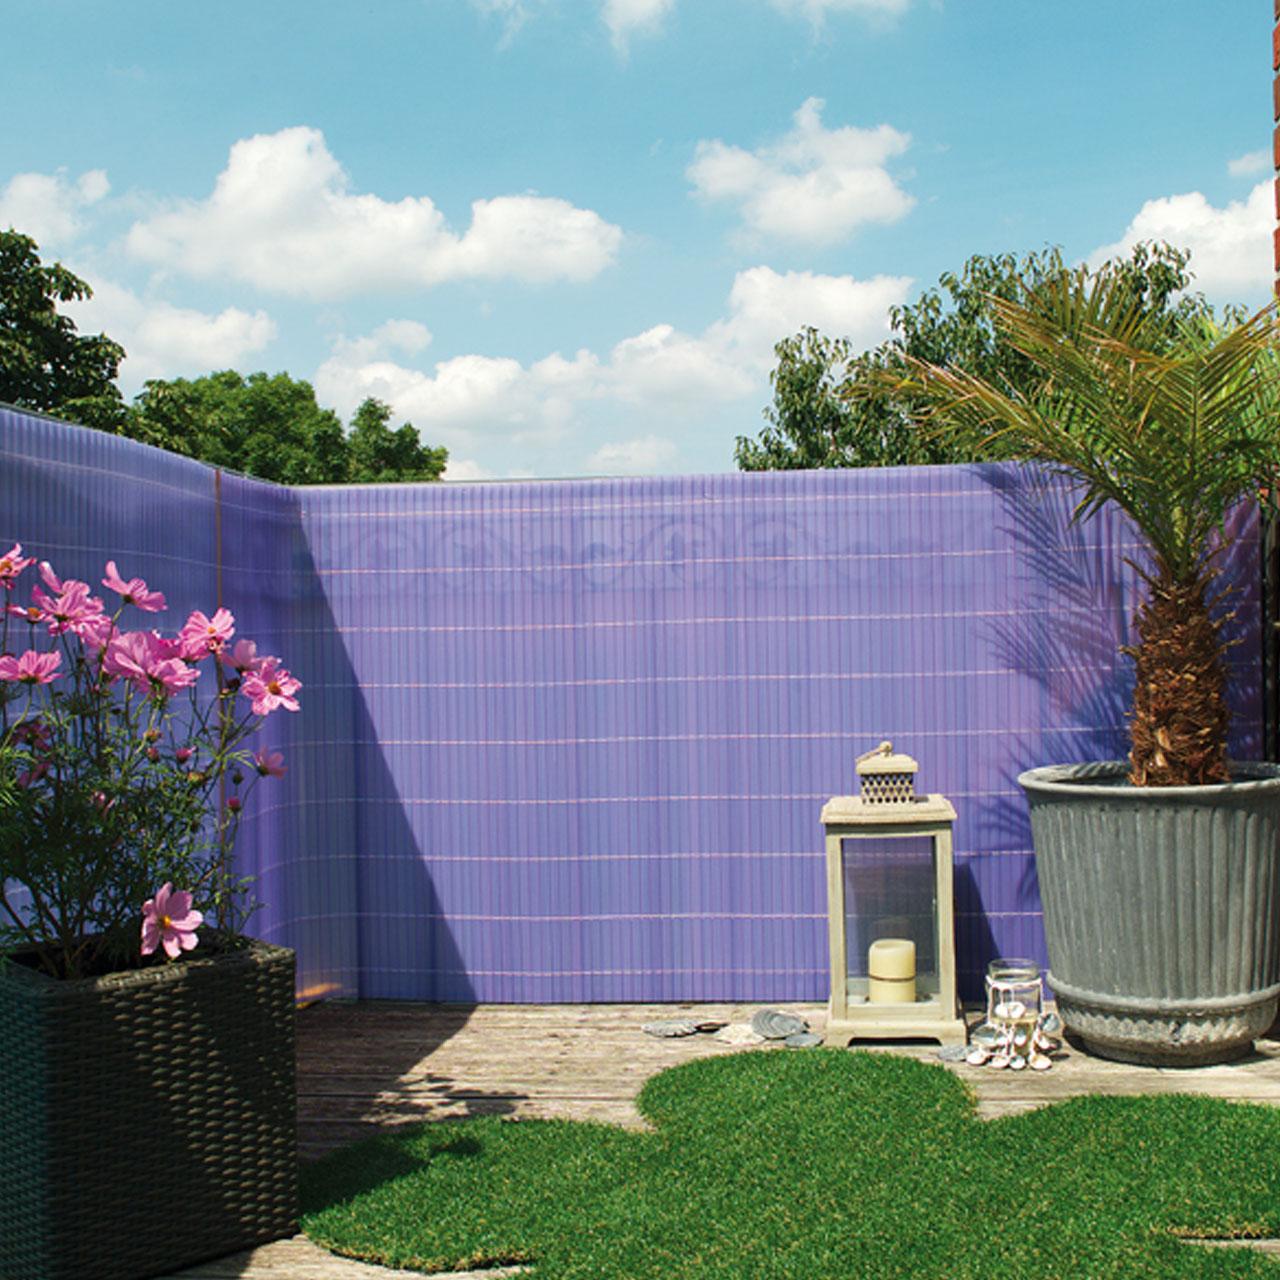 sichtschutzzaun pvc kunststoff montageset sunline flieder. Black Bedroom Furniture Sets. Home Design Ideas